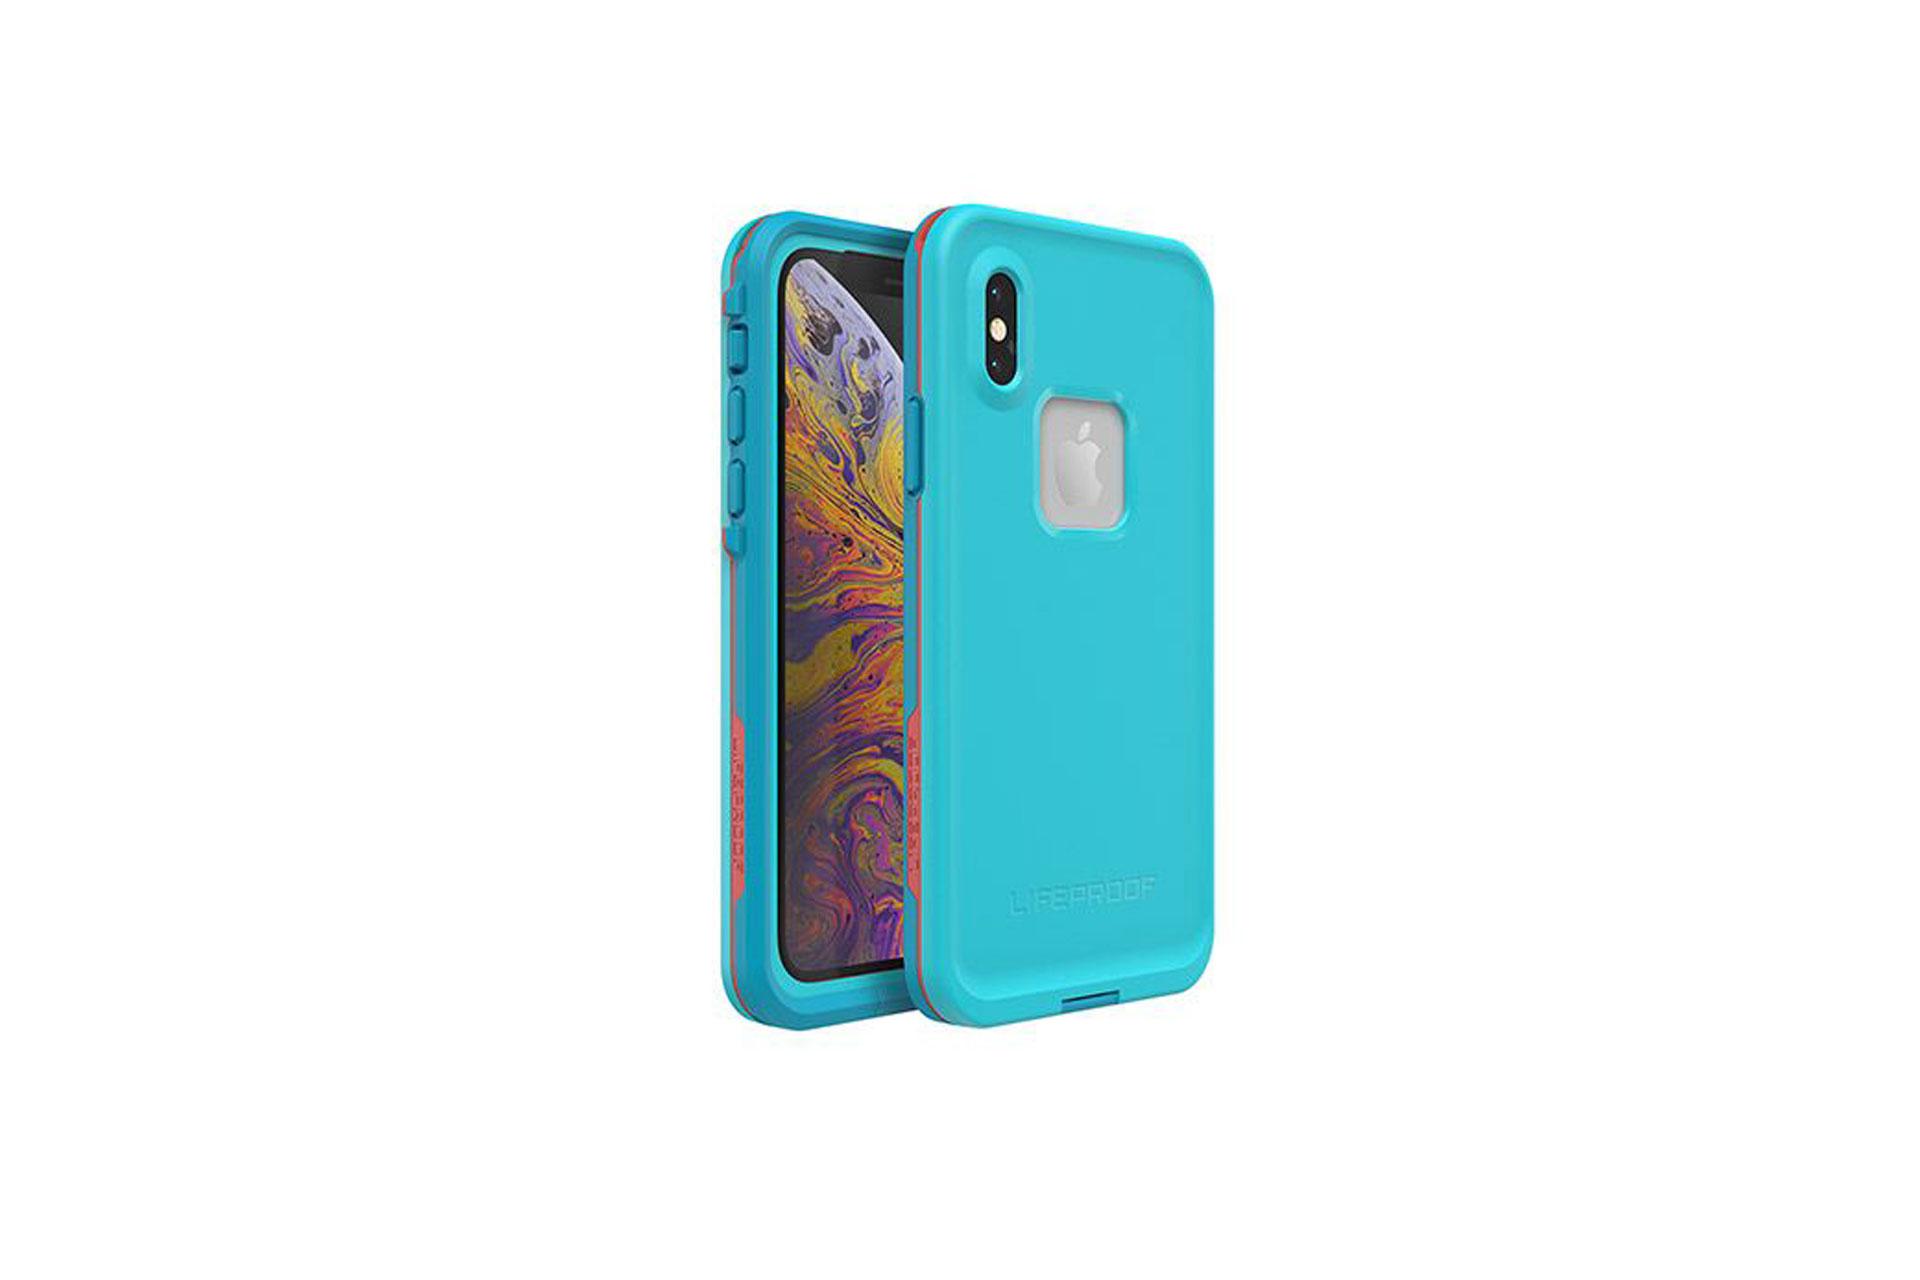 Waterproof Phone Case; Courtesy of Amazon